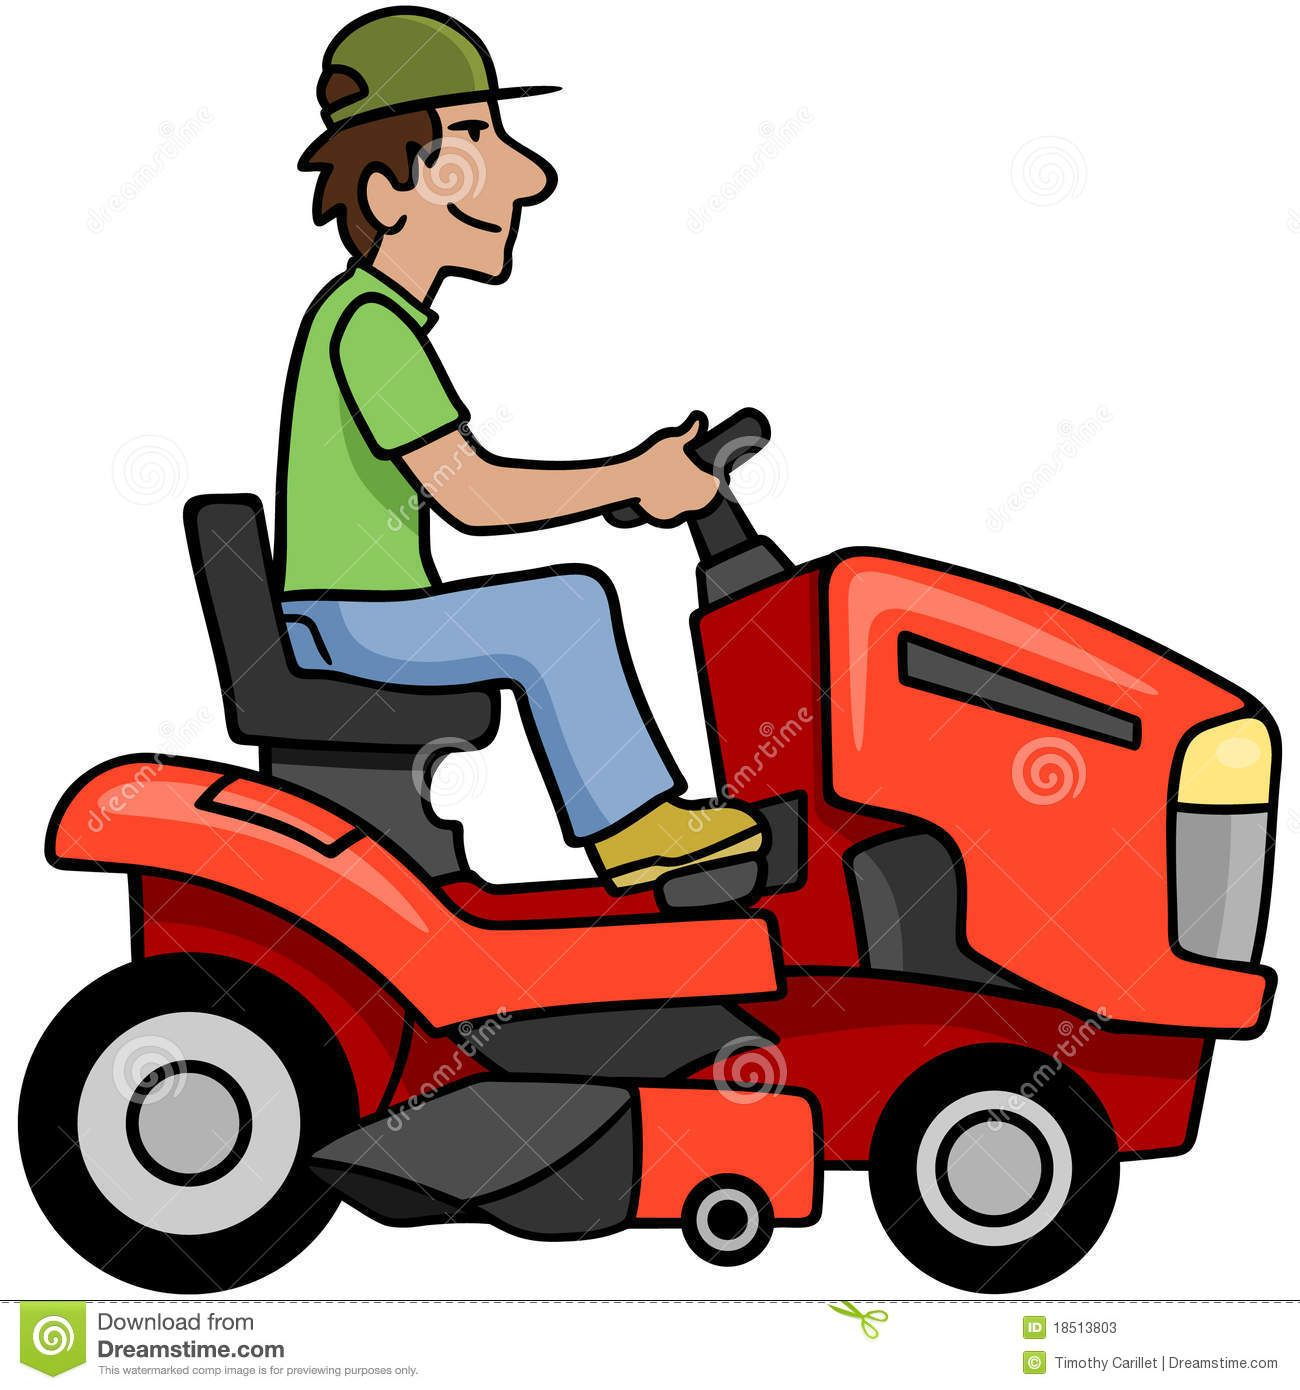 Riding Mower Cartoon Man On A Riding Mower Sponsored Advertisement Sponsored Mower Mower Riding Riding Riding Mower Lawn Mower Mower